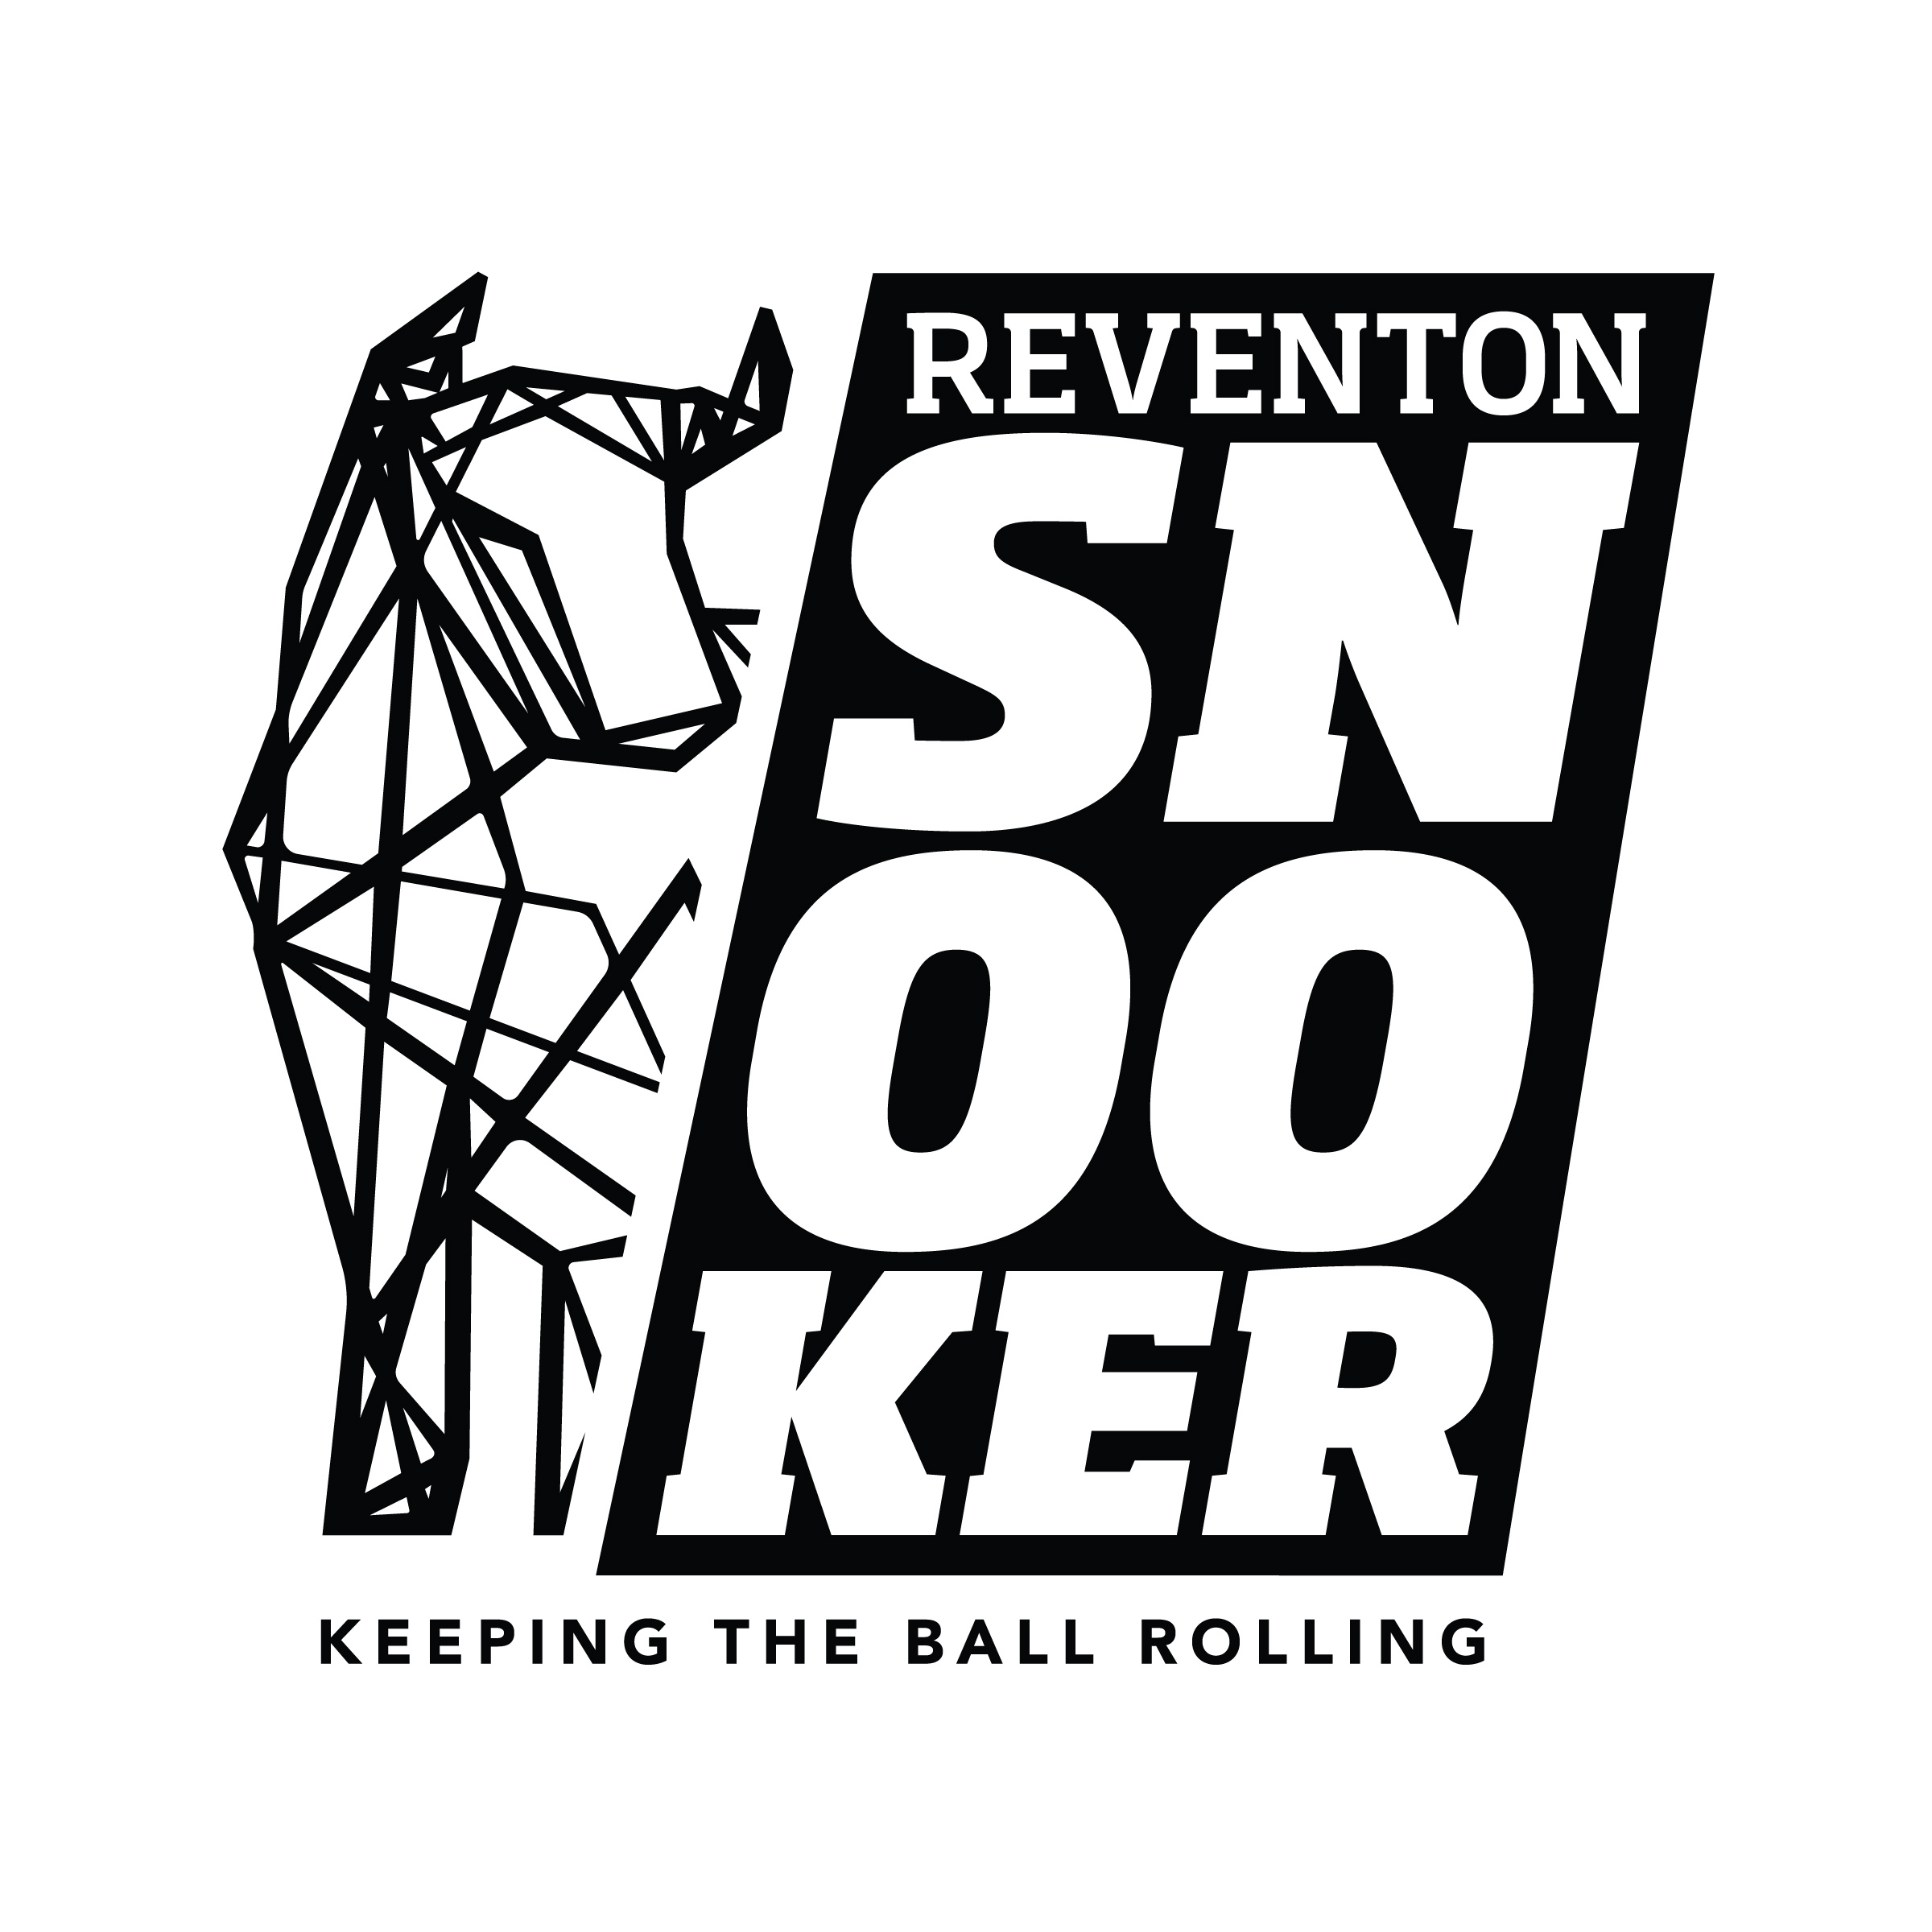 RevSnooker-2400px.jpg